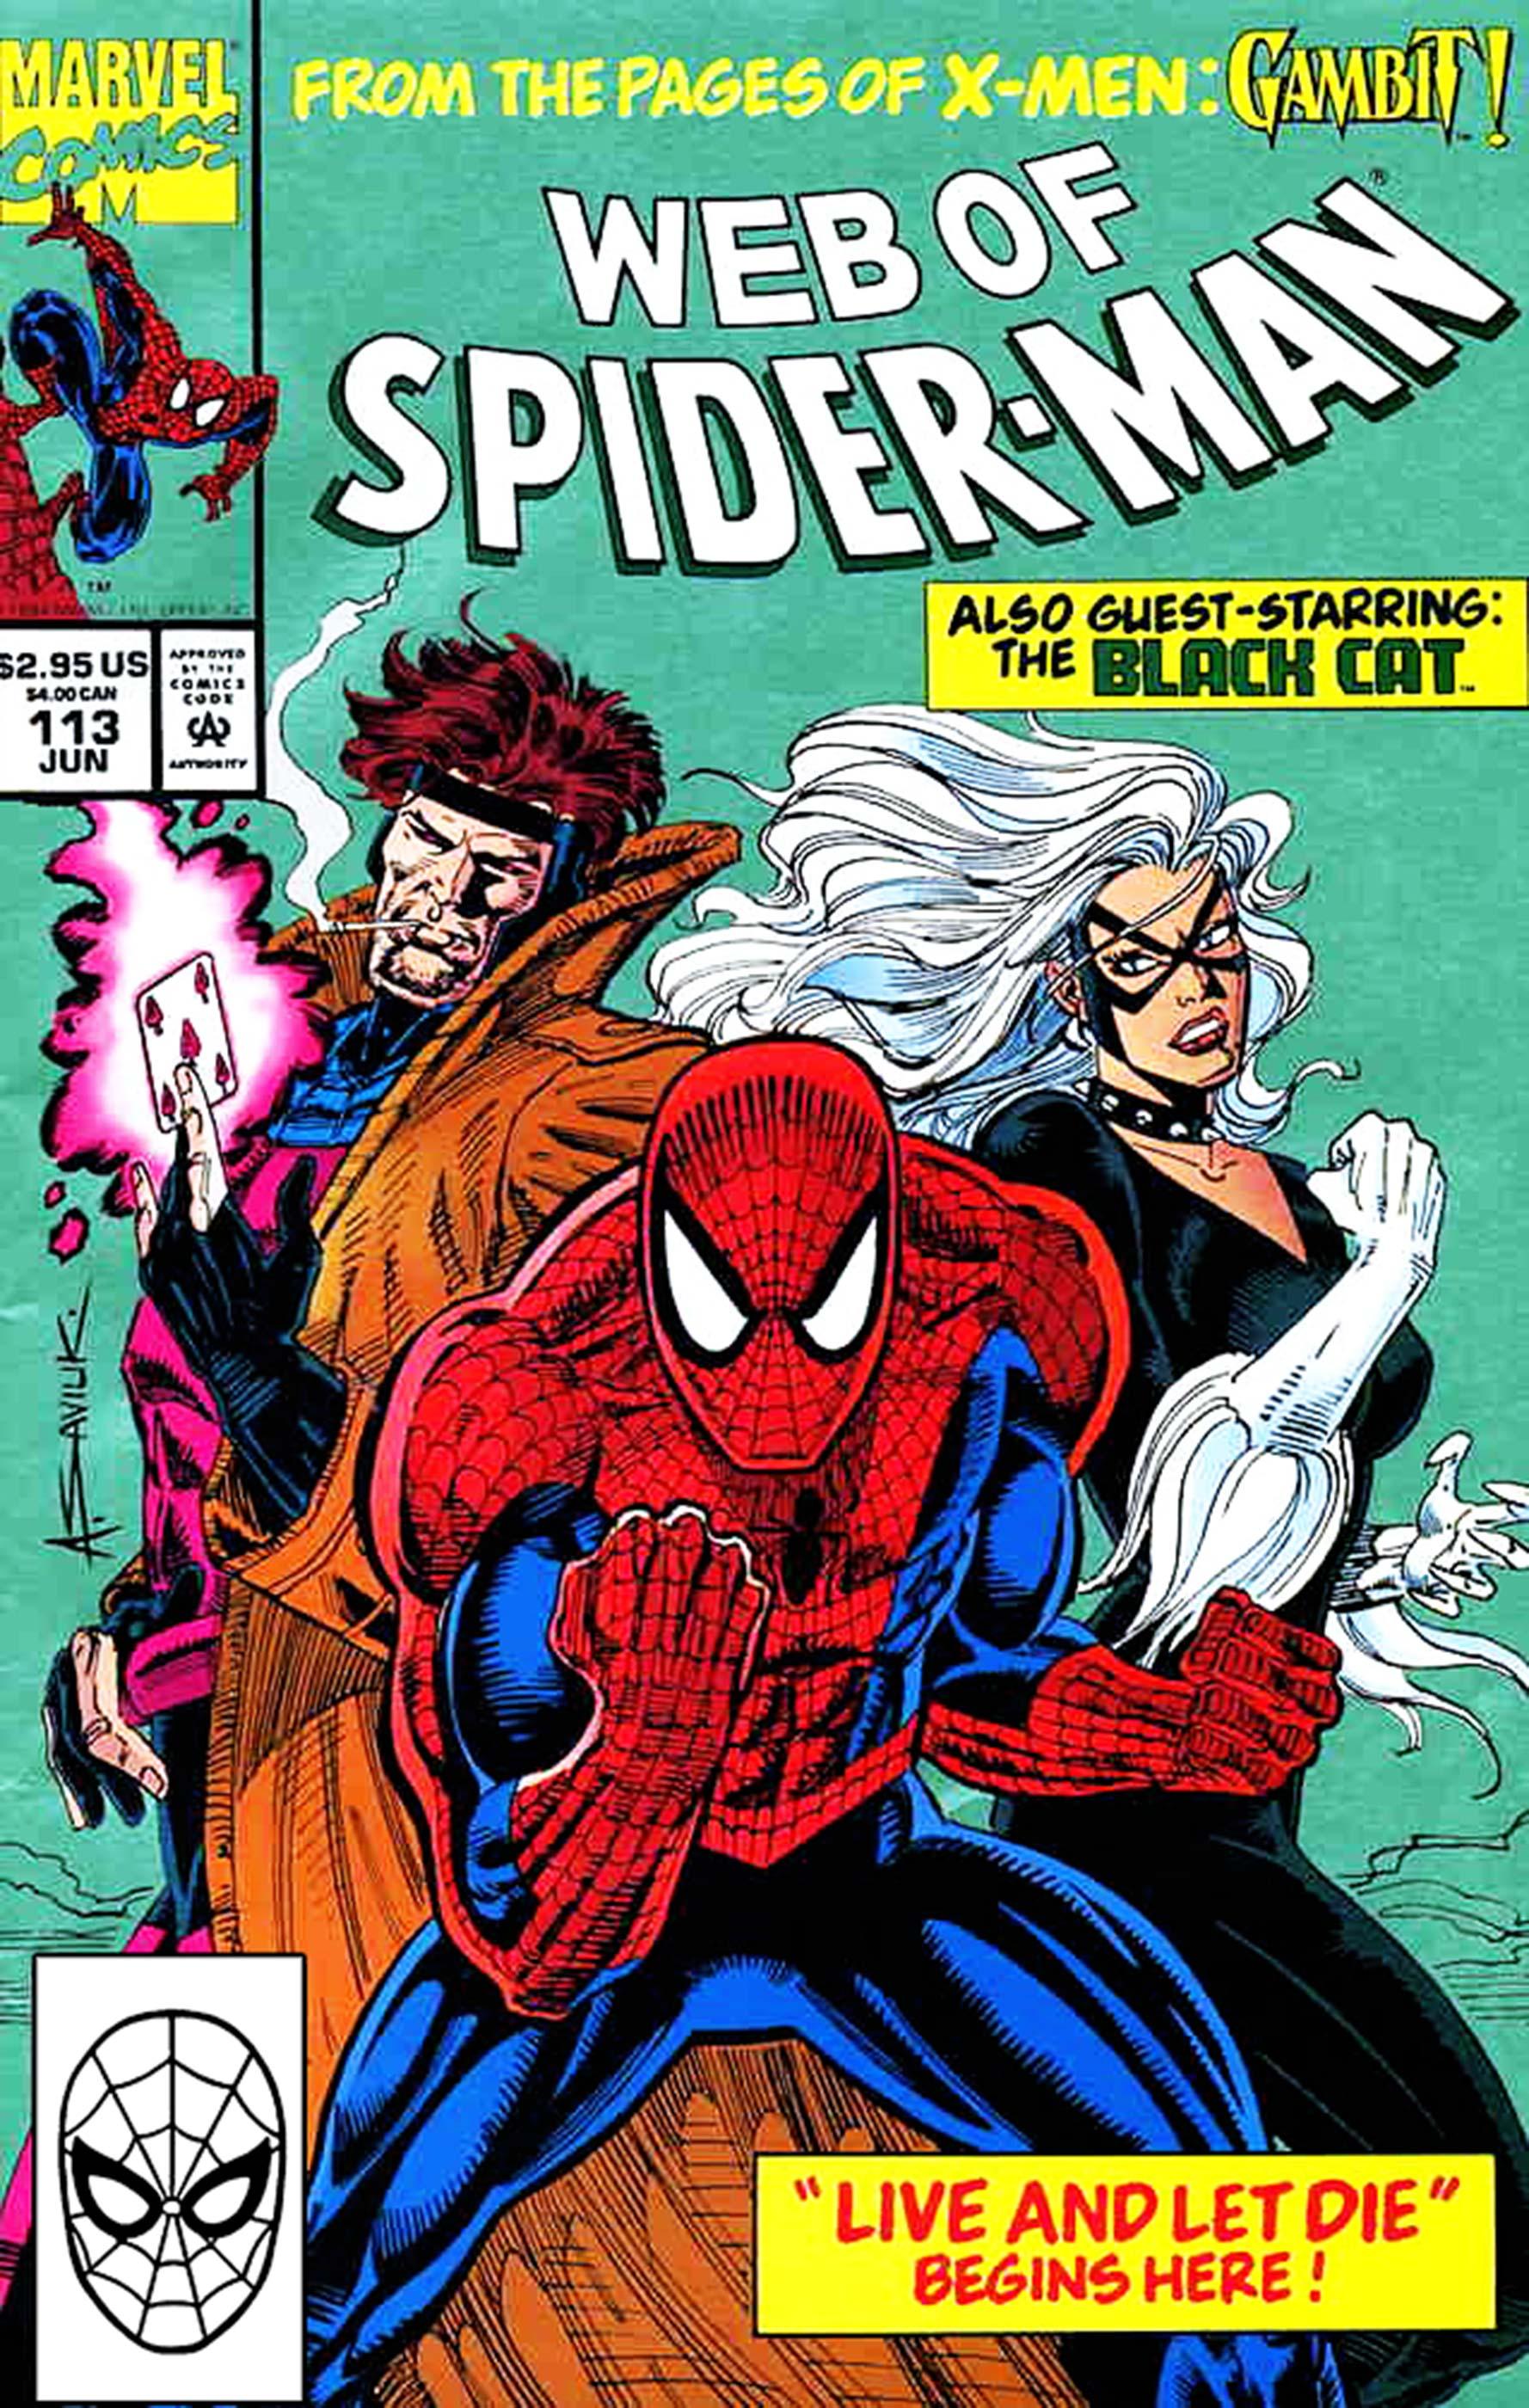 Web of Spider-Man (1985) #113